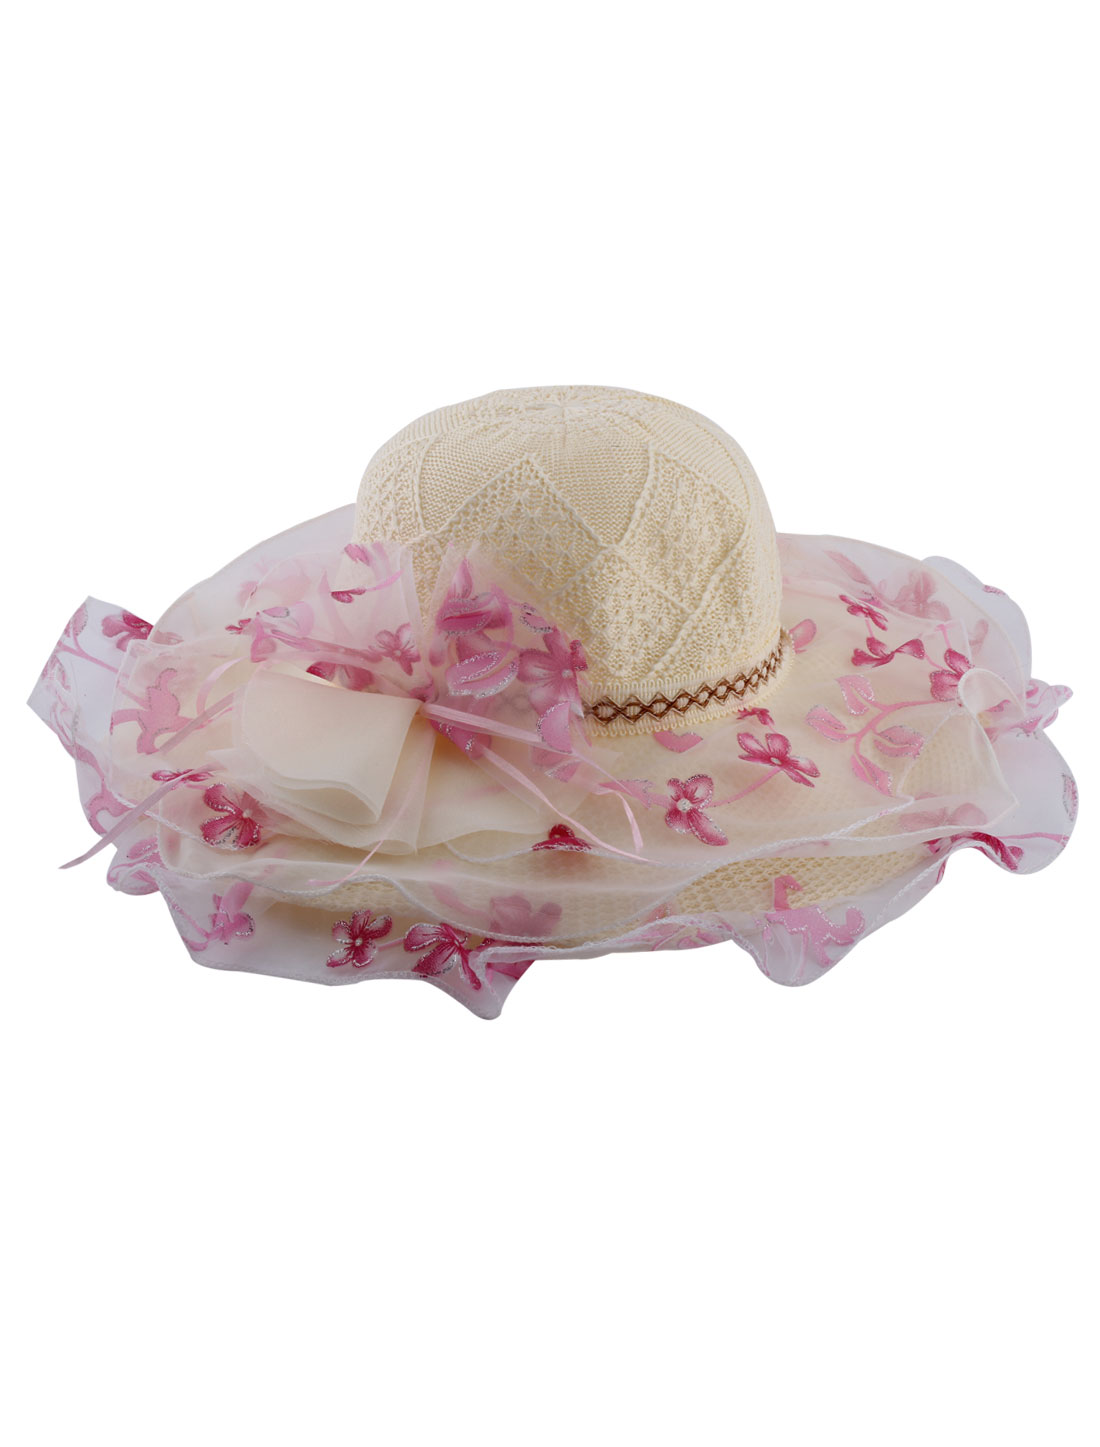 Lady Organza Surrounded Flowers Detail Wide Brim Beach Travel Sun Hat Cap Beige Pink